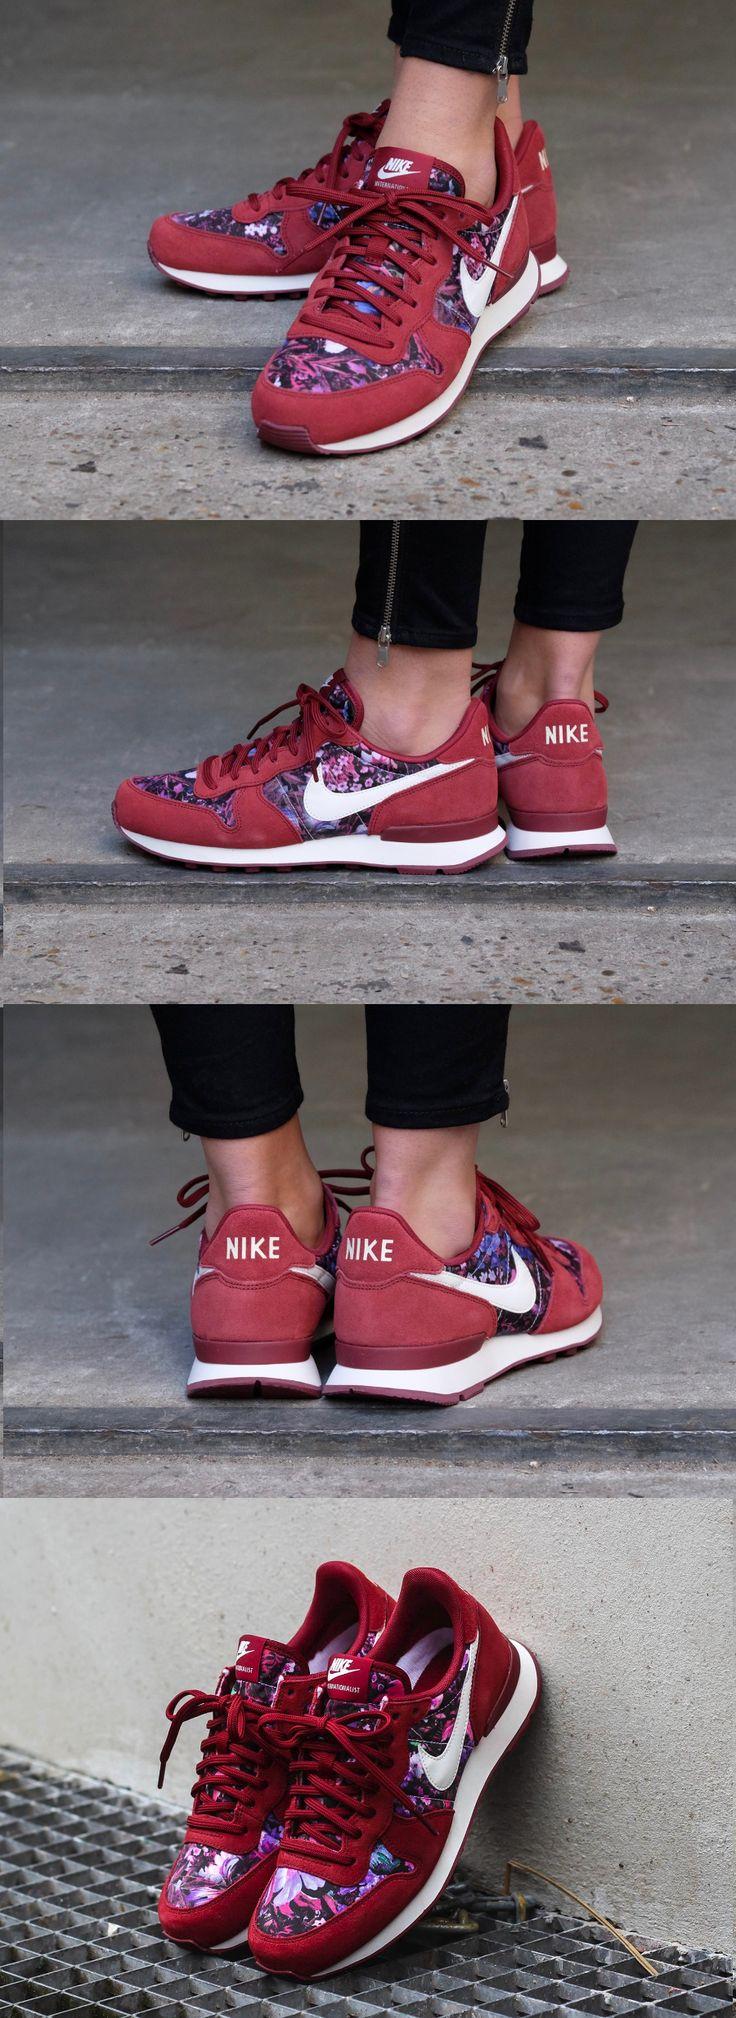 #Nike #Wmns #Internationalist #Premium #Flowers #red  http://store.nike.com/fr/fr_fr/pd/chaussure-internationalist-pour/pid-11400584/pgid-11161876?cp=EUNS_AFF_WG_FR_121157